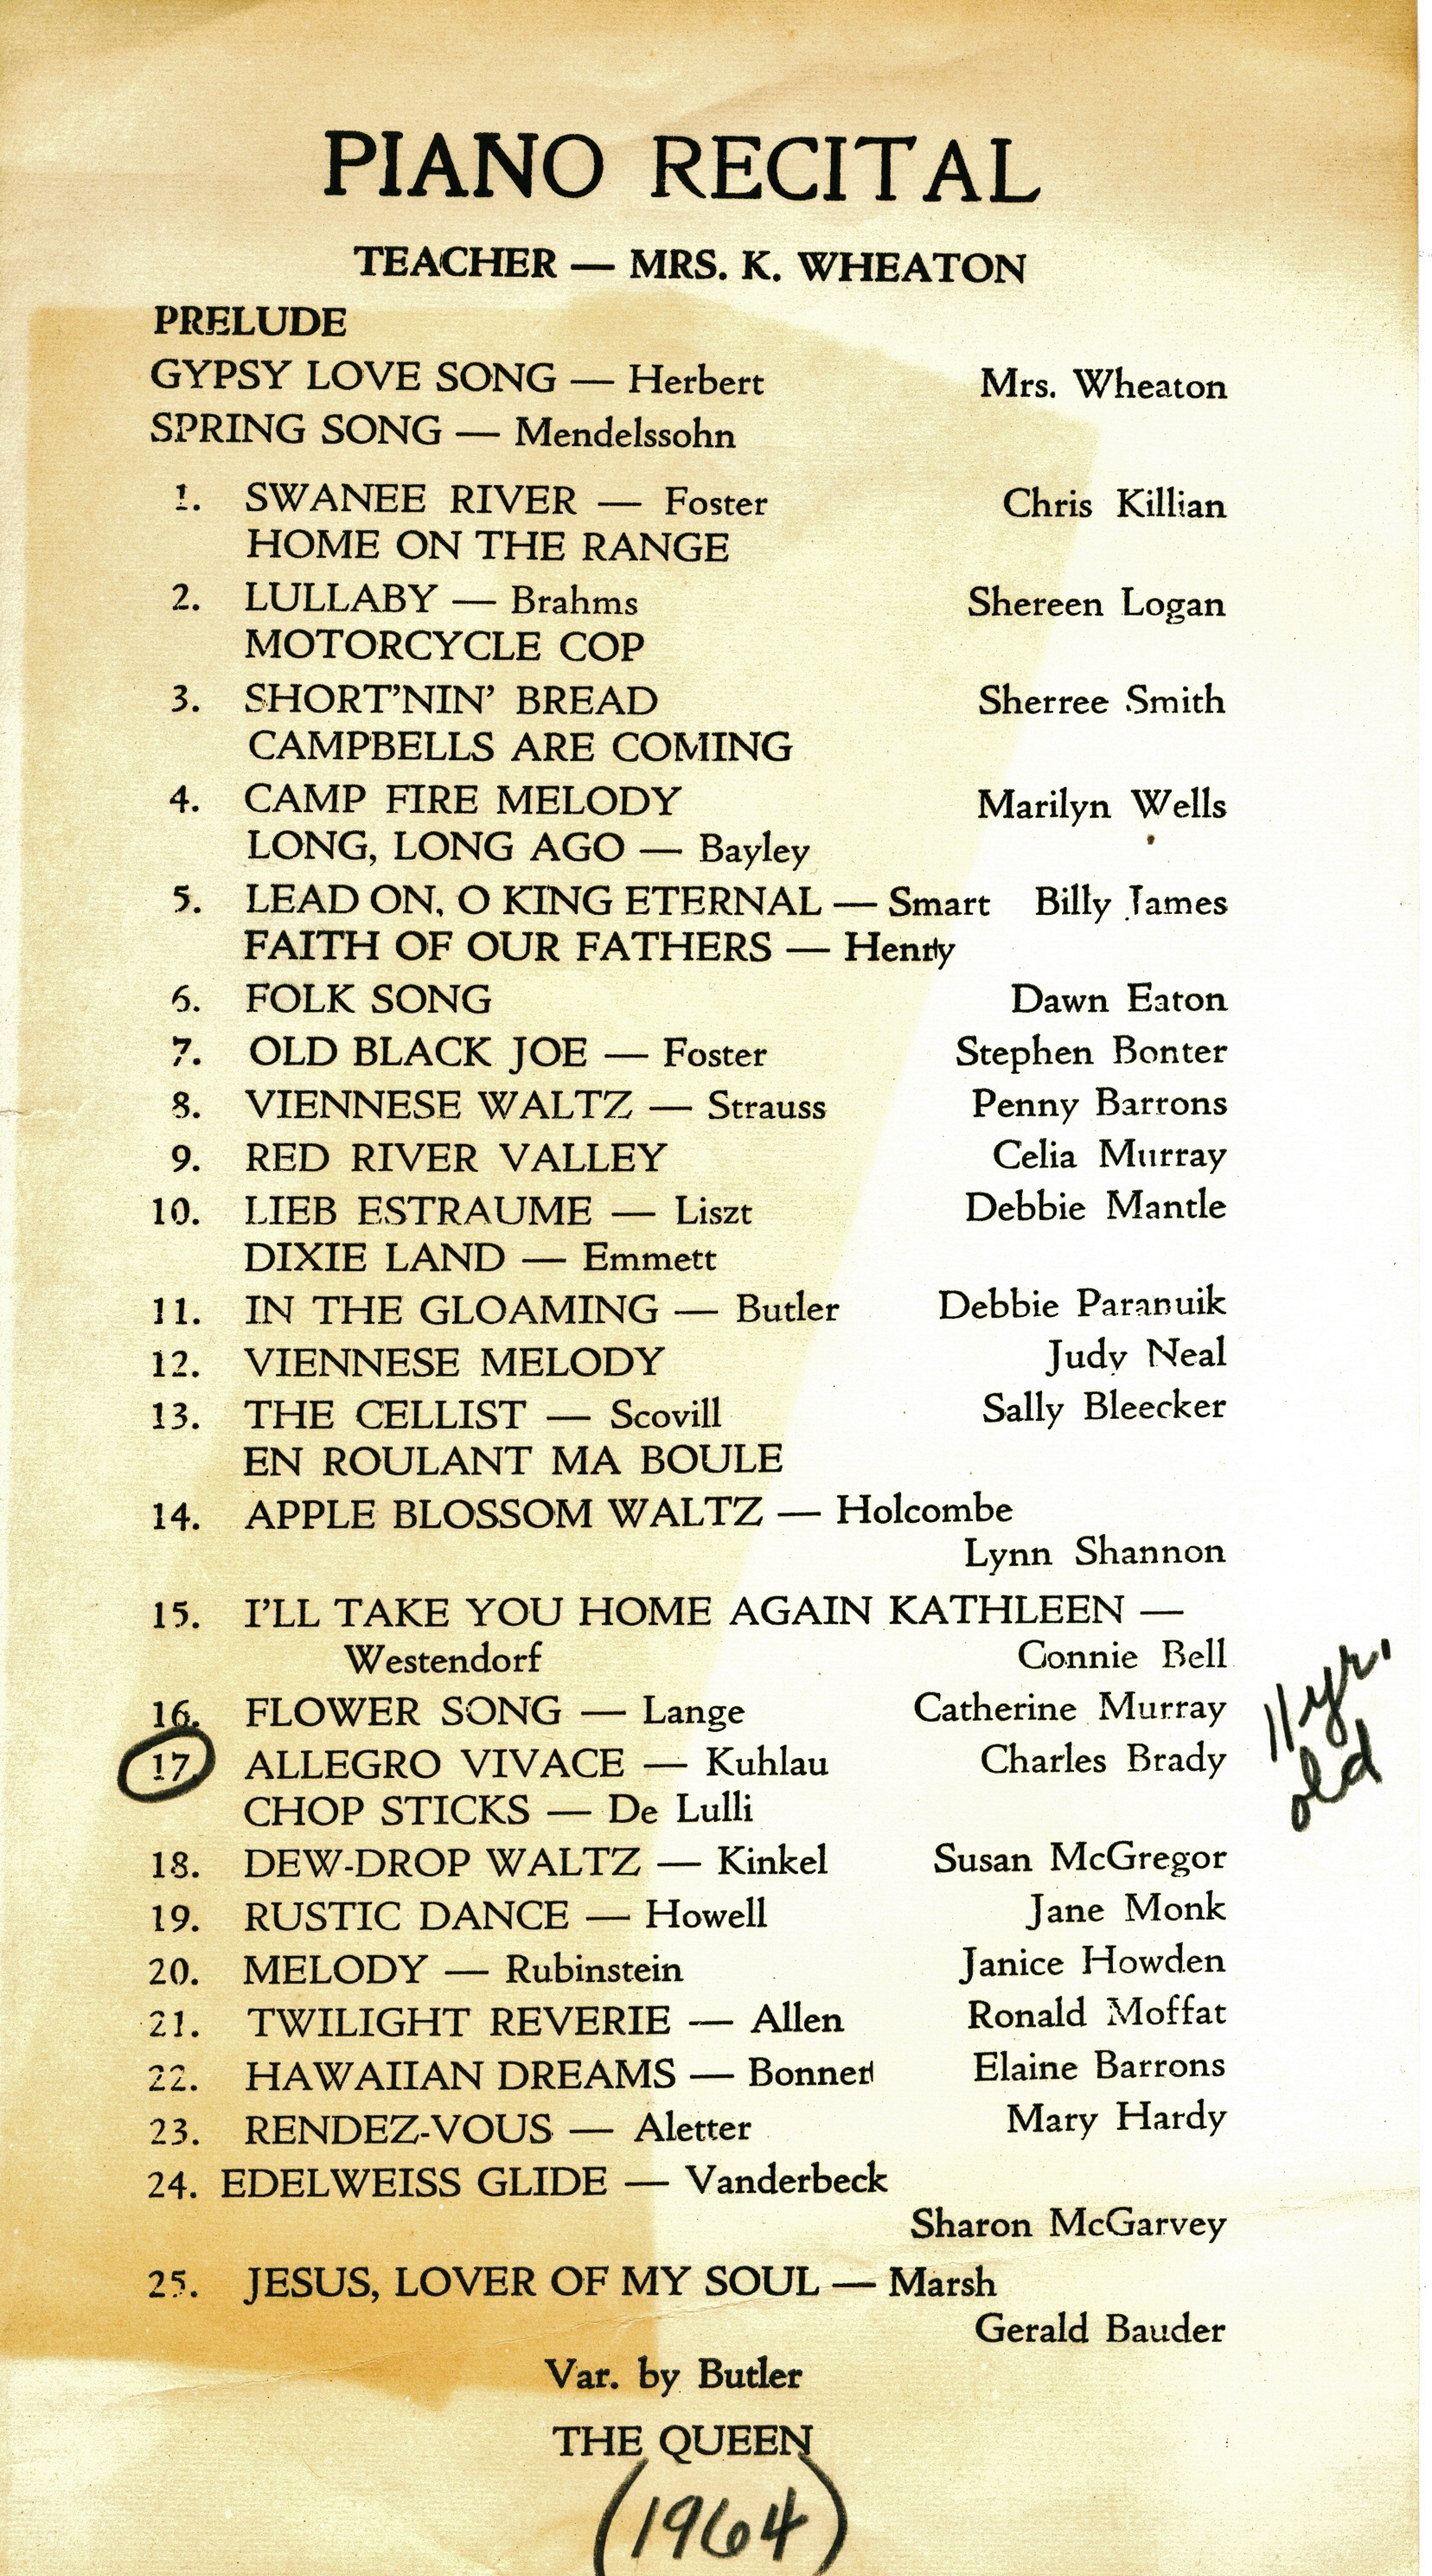 Mrs. Wheaton's Piano recital 1964.jpg